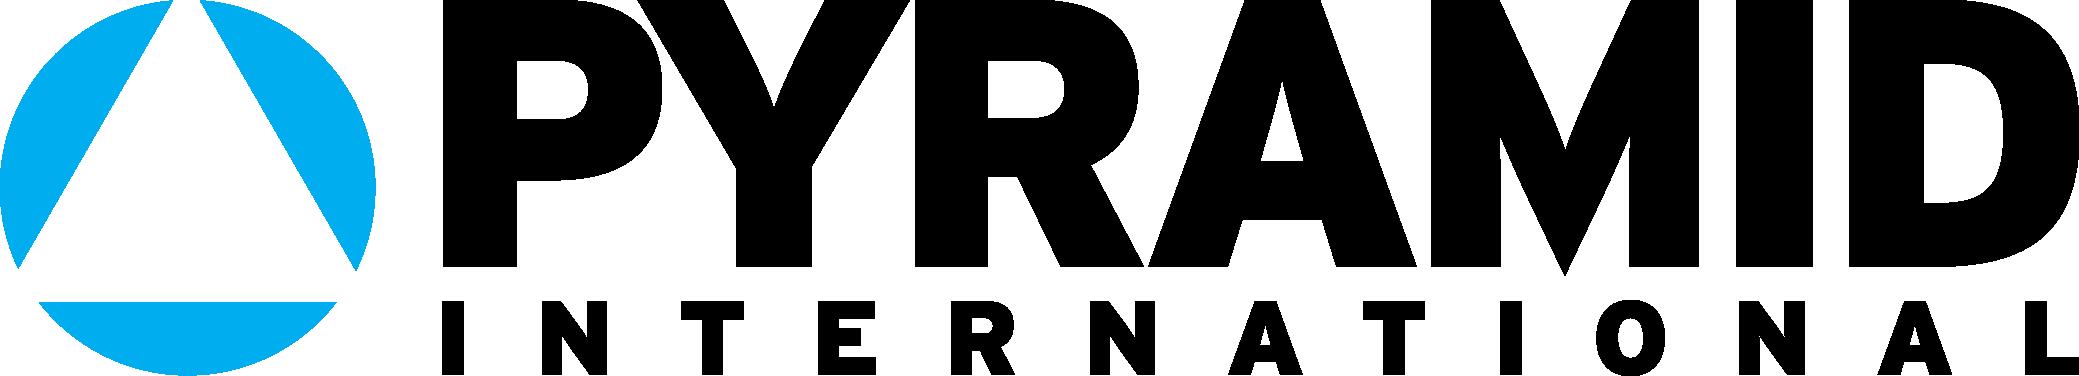 pyramid-international-logo